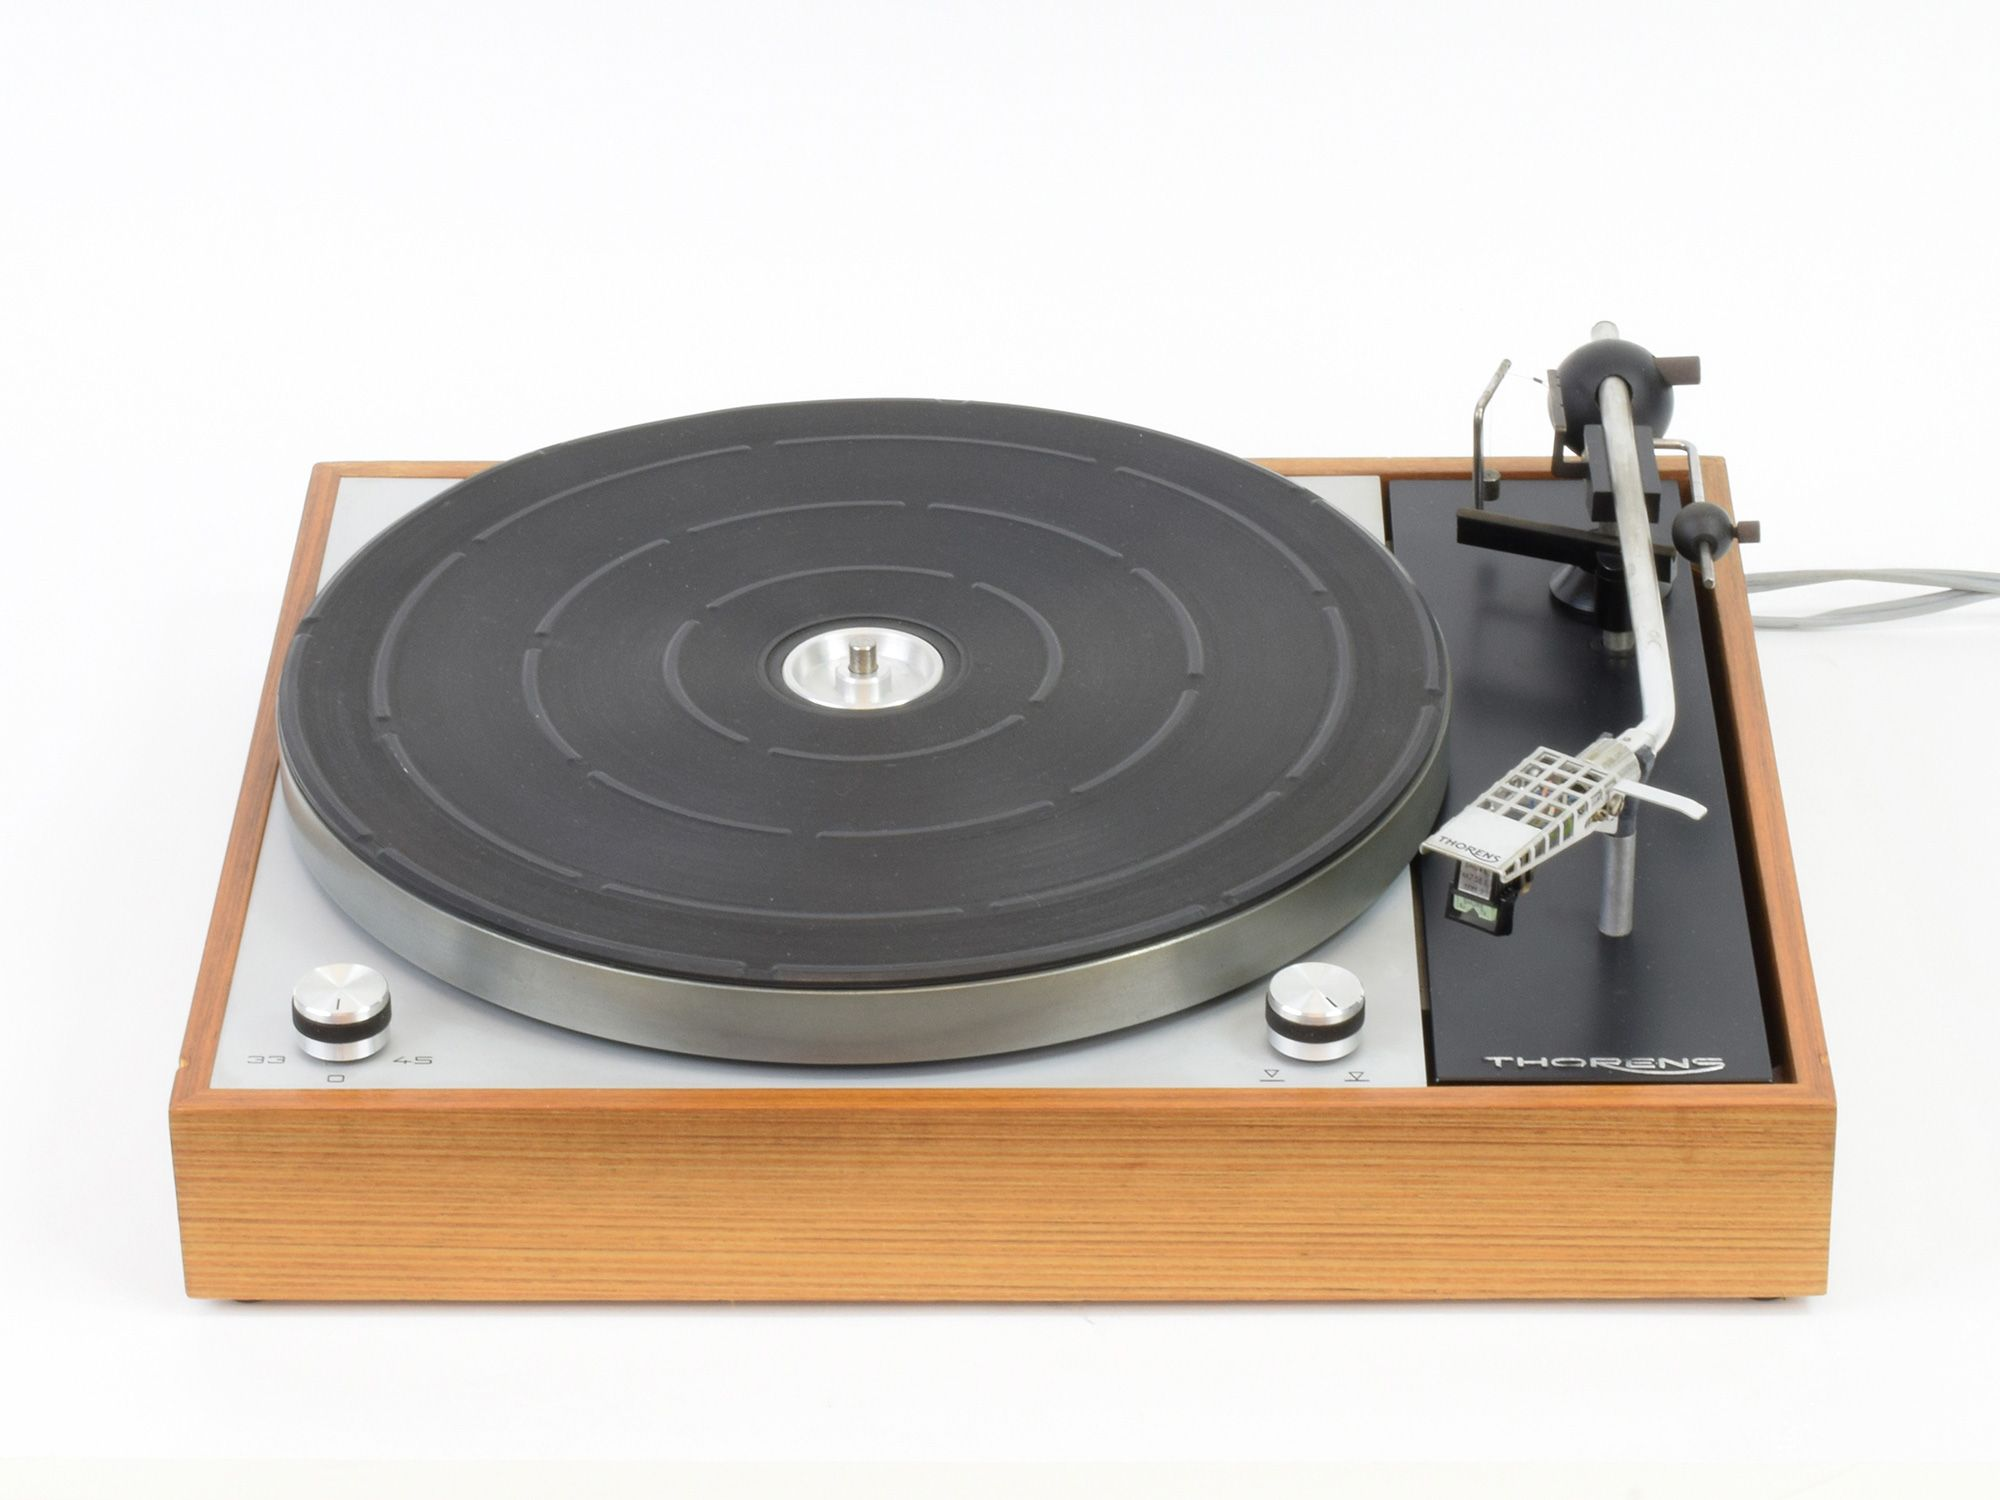 Thorens Td 150 Mk Ii Turntable My First Proper Record